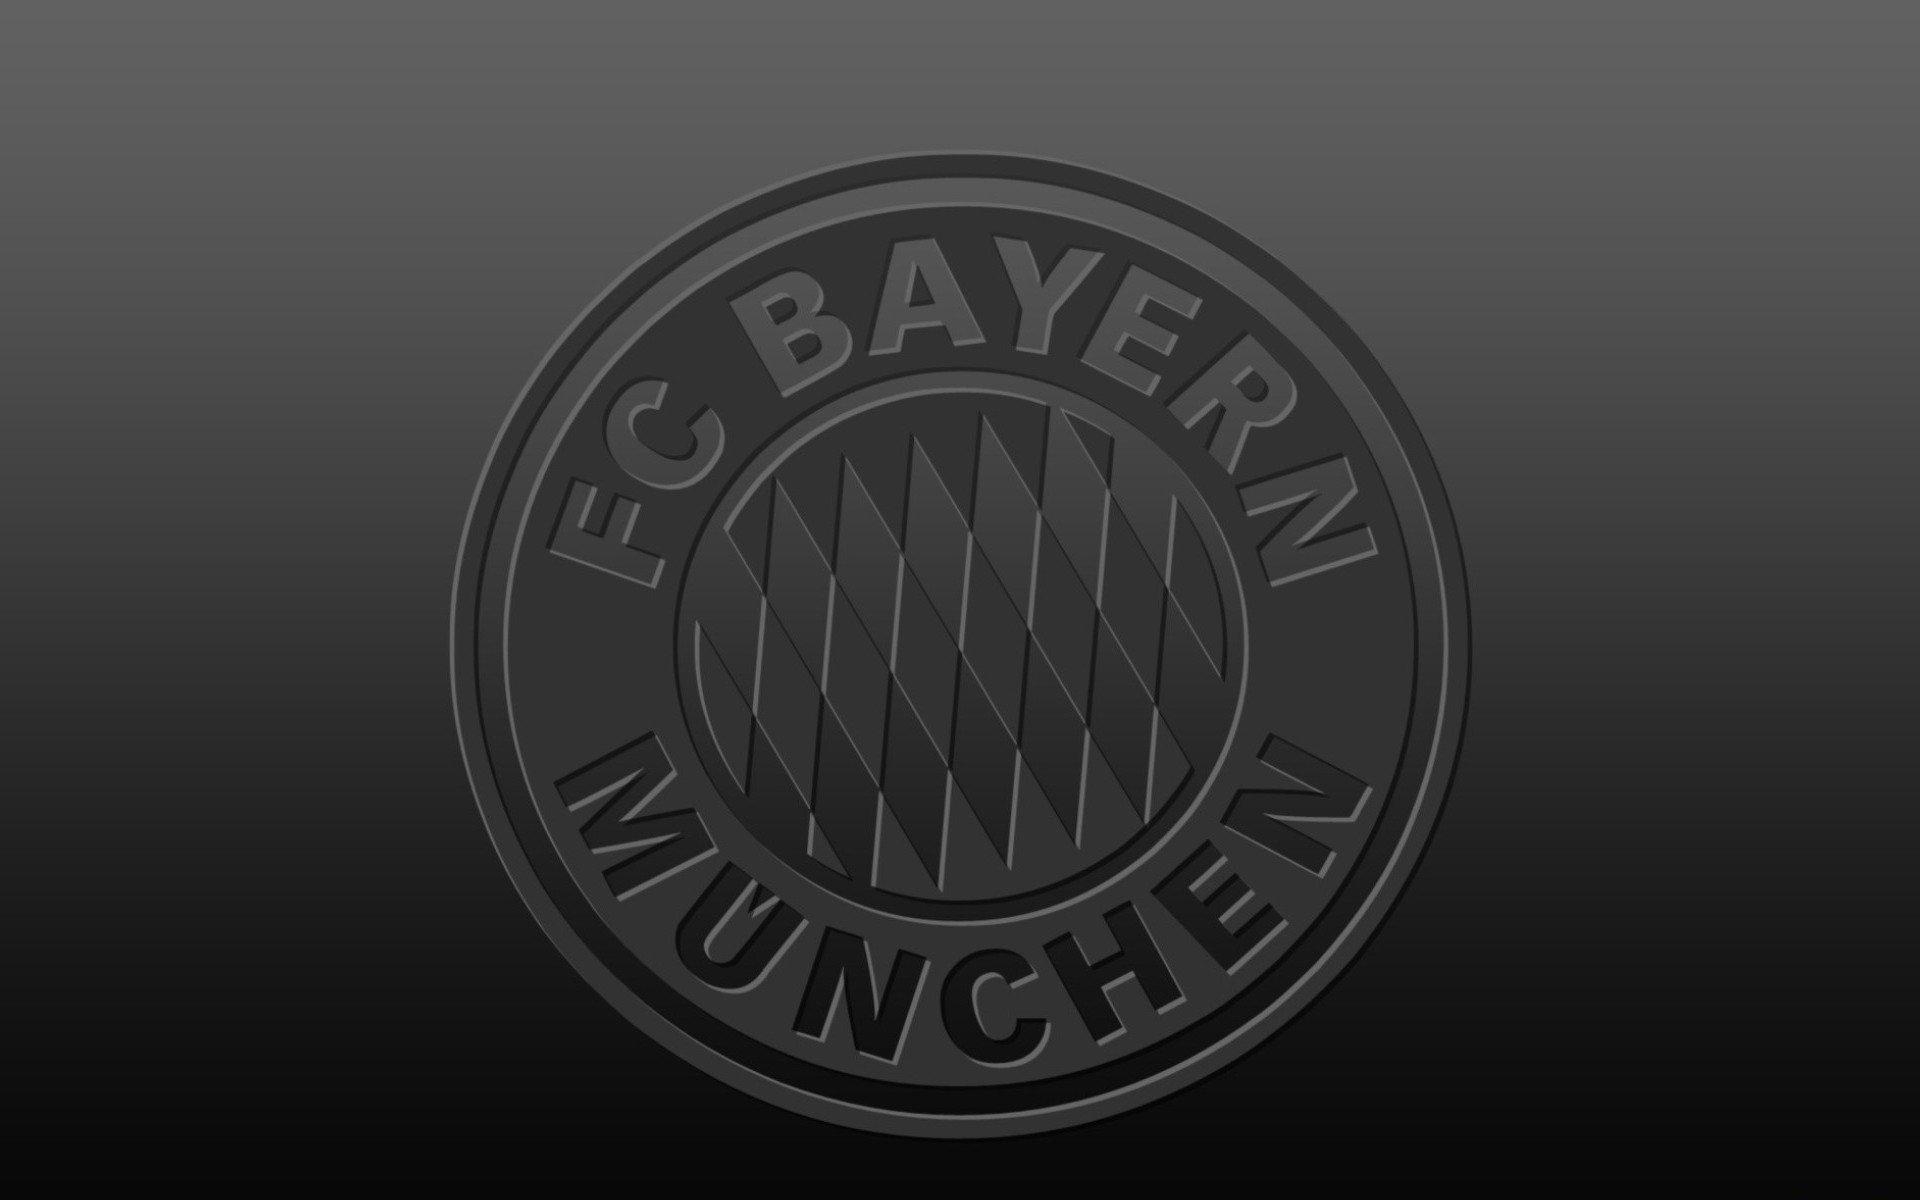 Fc bayern munich full hd wallpaper and background image 1920x1200 sports fc bayern munich bayern munich wallpaper voltagebd Images